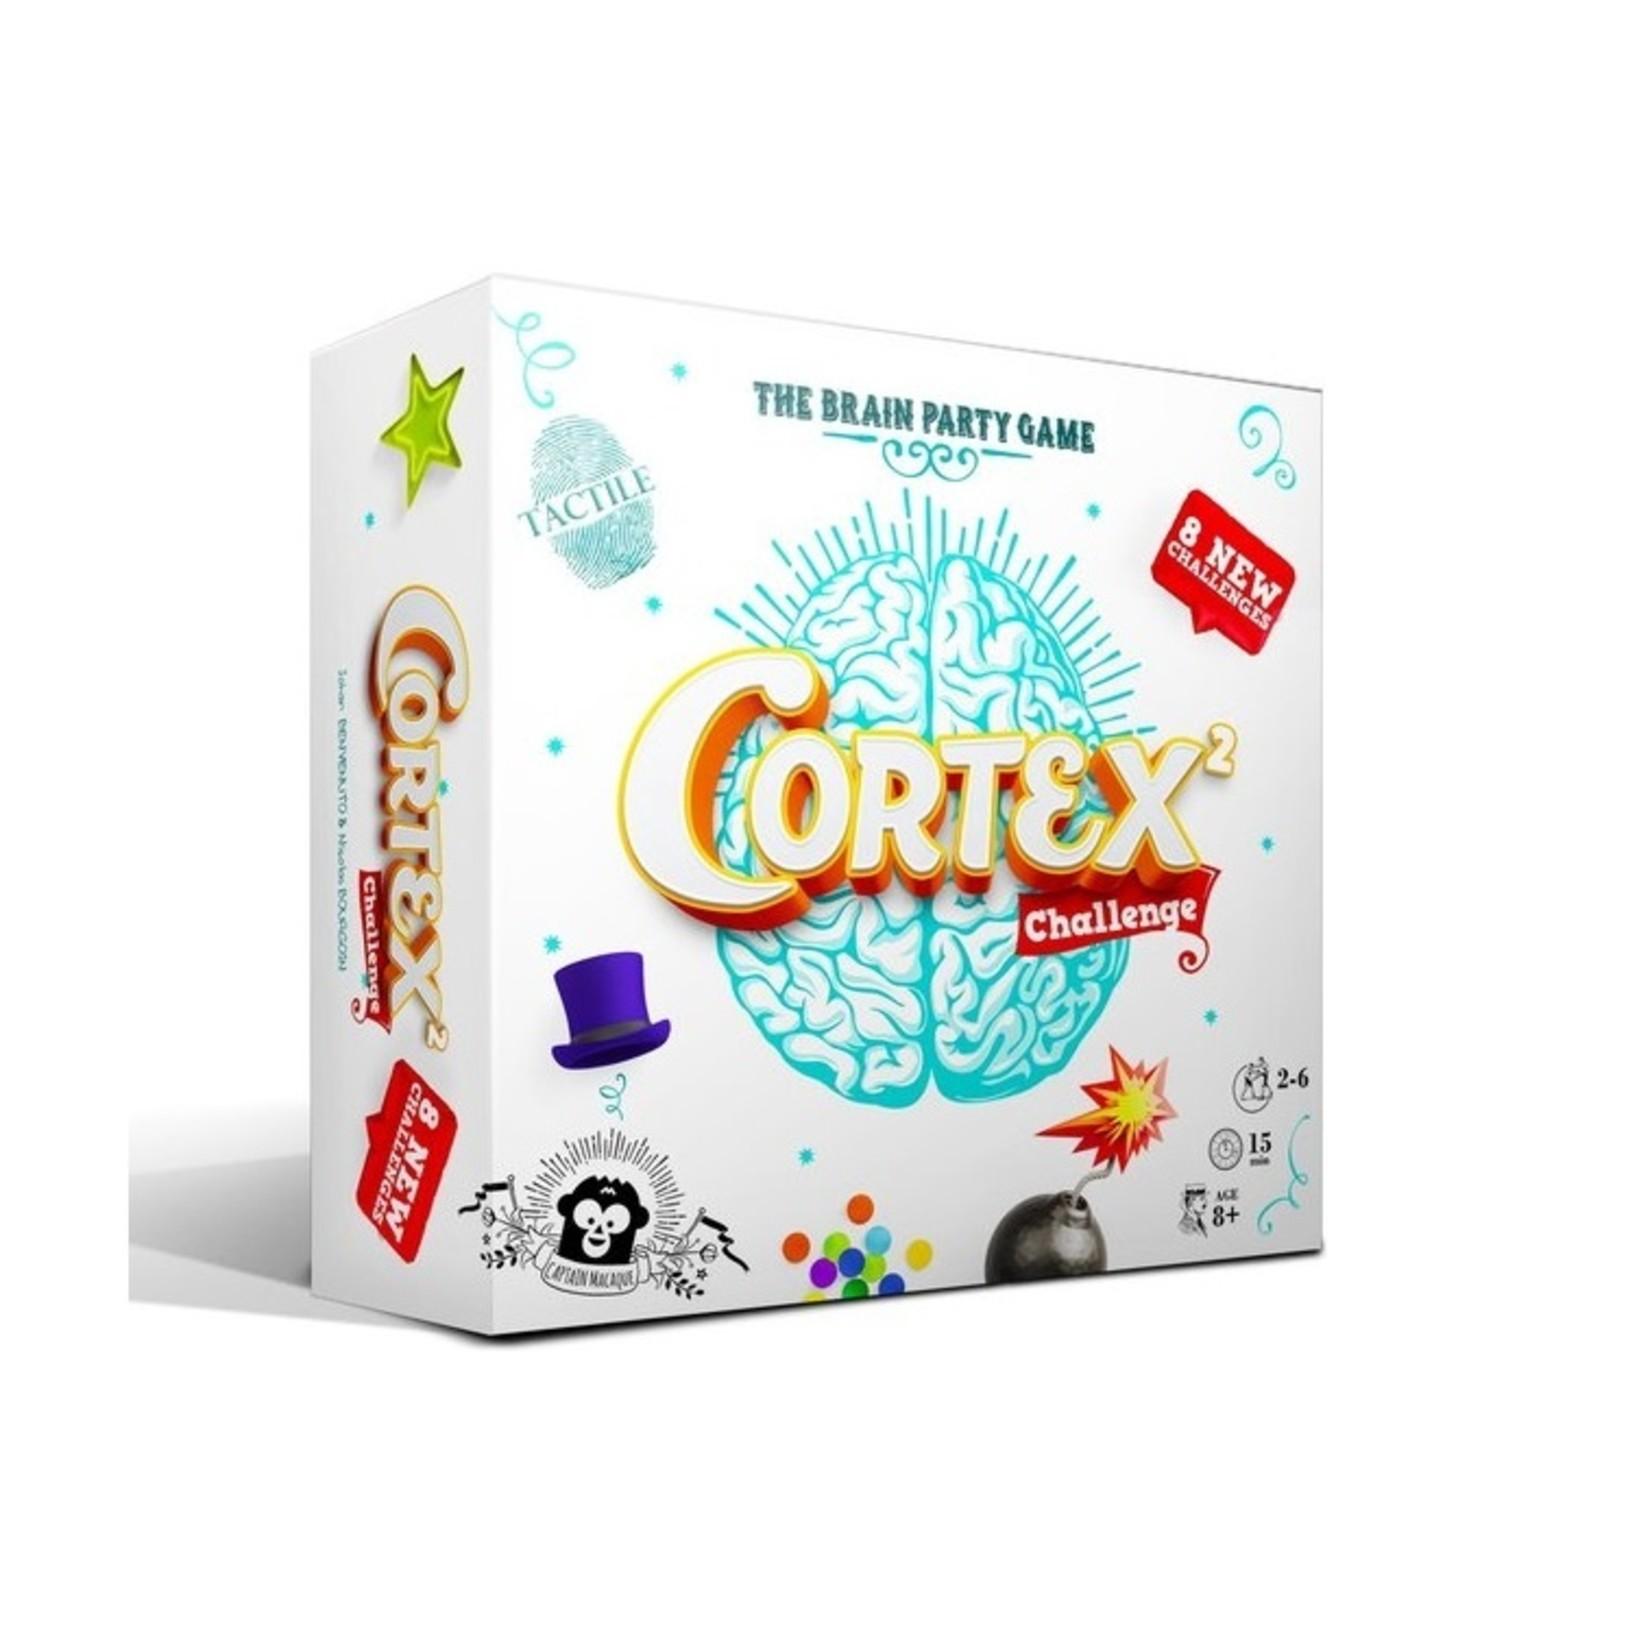 Zygomatic Cortex Challenge 2